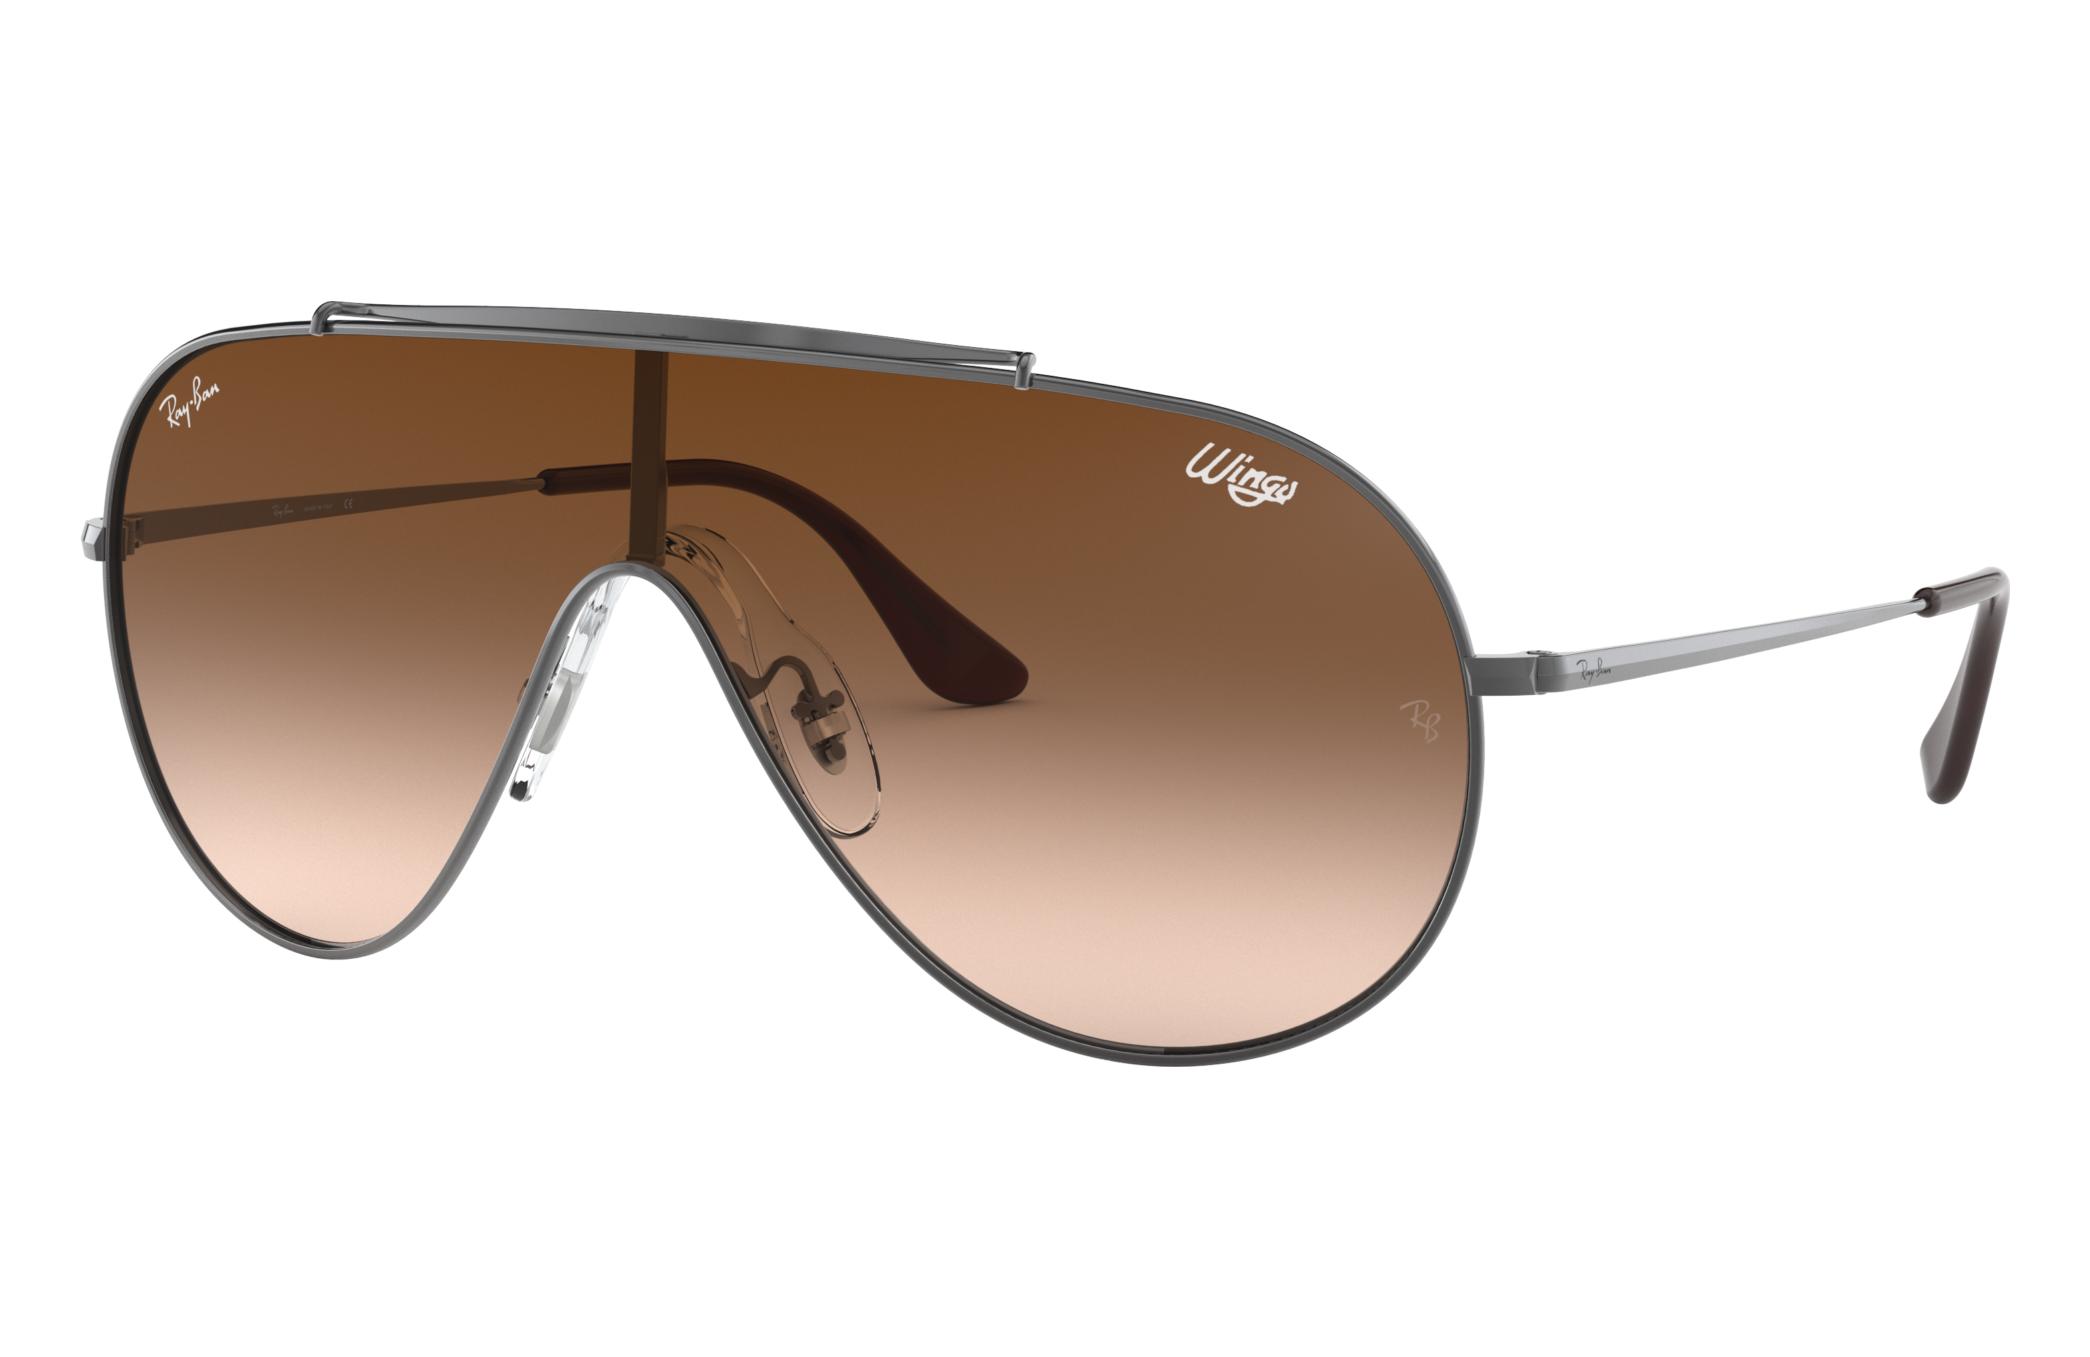 Ray-Ban Wings Gunmetal, Brown Lenses - RB3597